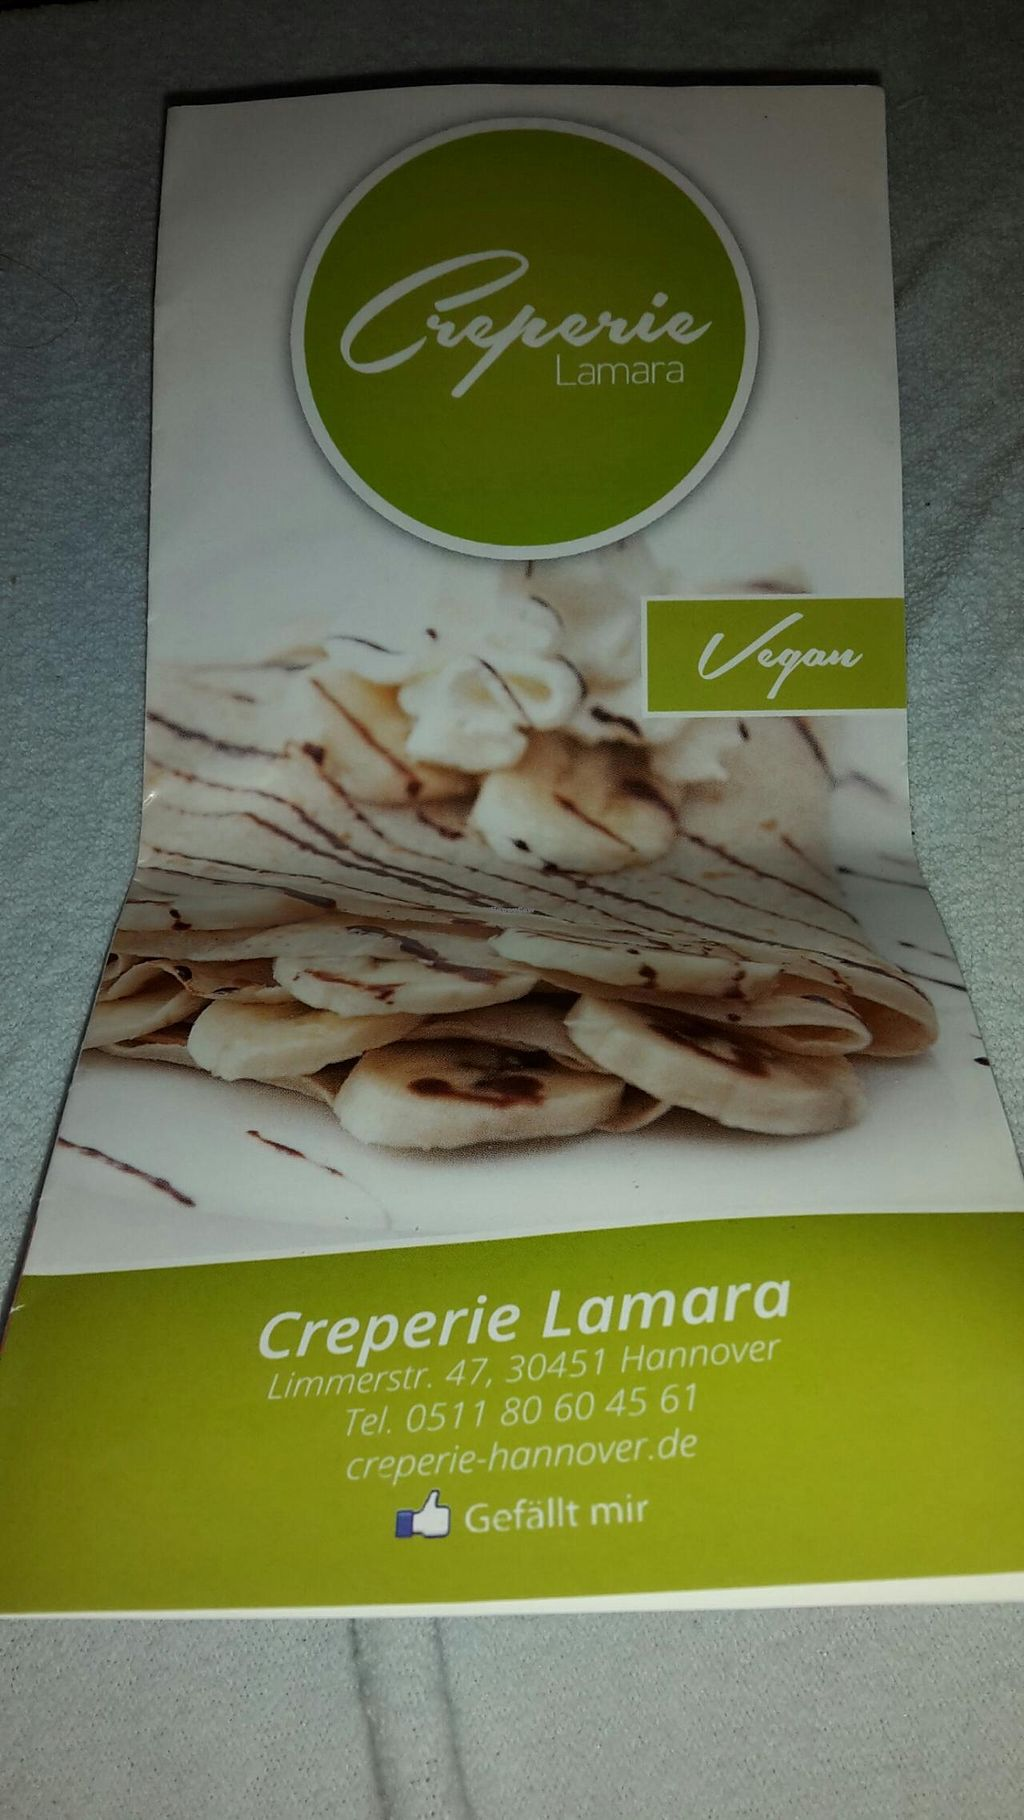 "Photo of Creperie Lamara  by <a href=""/members/profile/PatrickVerde"">PatrickVerde</a> <br/>Vegan menu <br/> June 1, 2015  - <a href='/contact/abuse/image/40490/104402'>Report</a>"